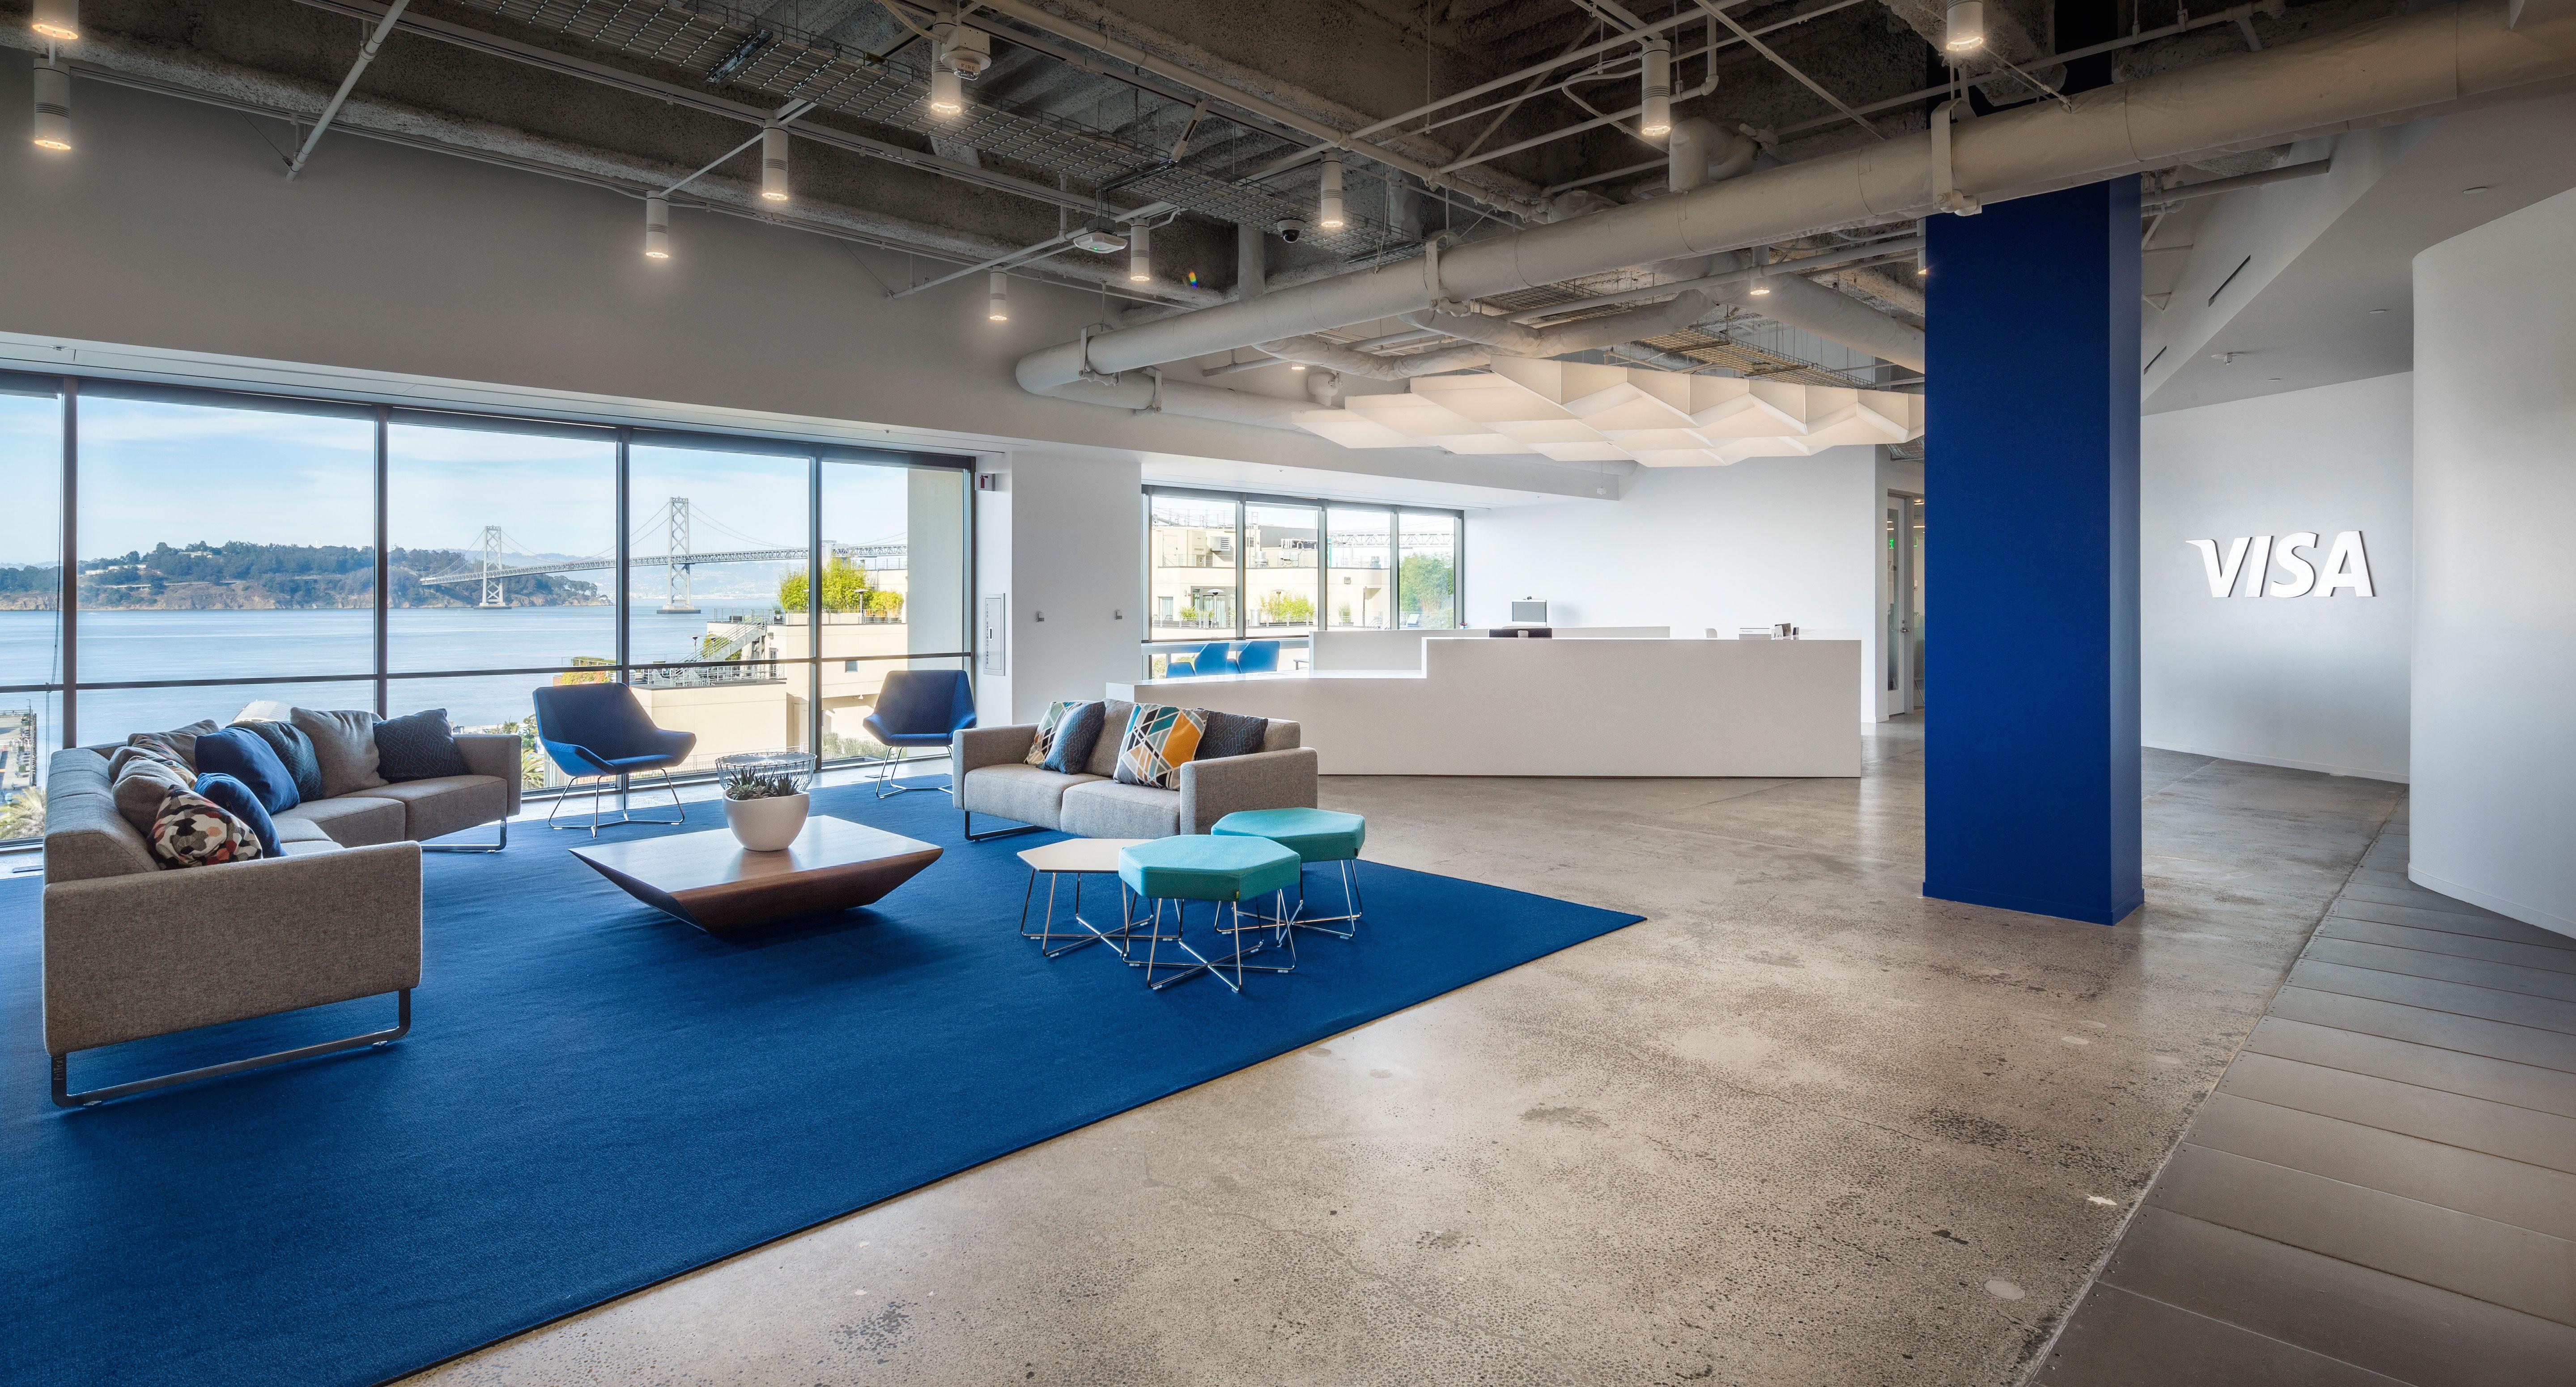 Visa Opens San Francisco Technology Center To Advance